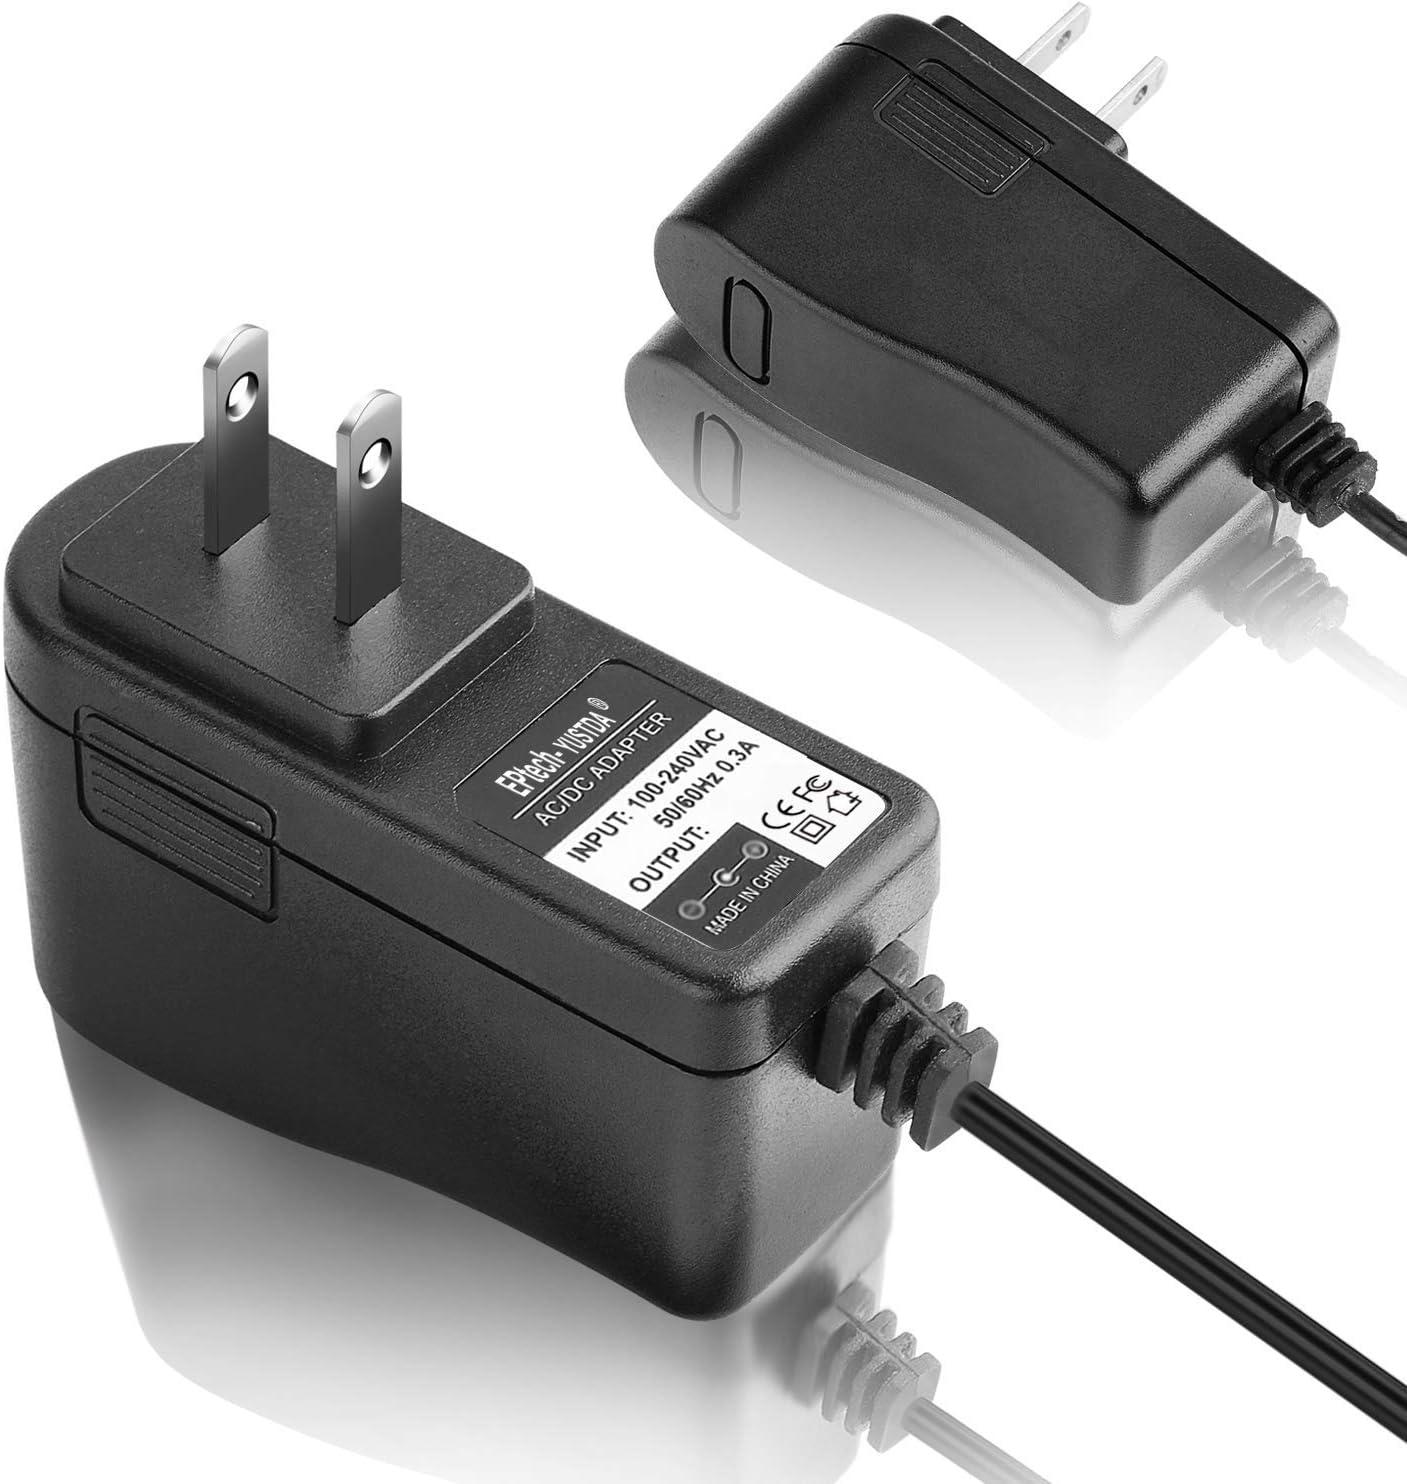 Wall Charger Adapter for LIONLEDB Black-Trim Black /& Decker LED Spotlight